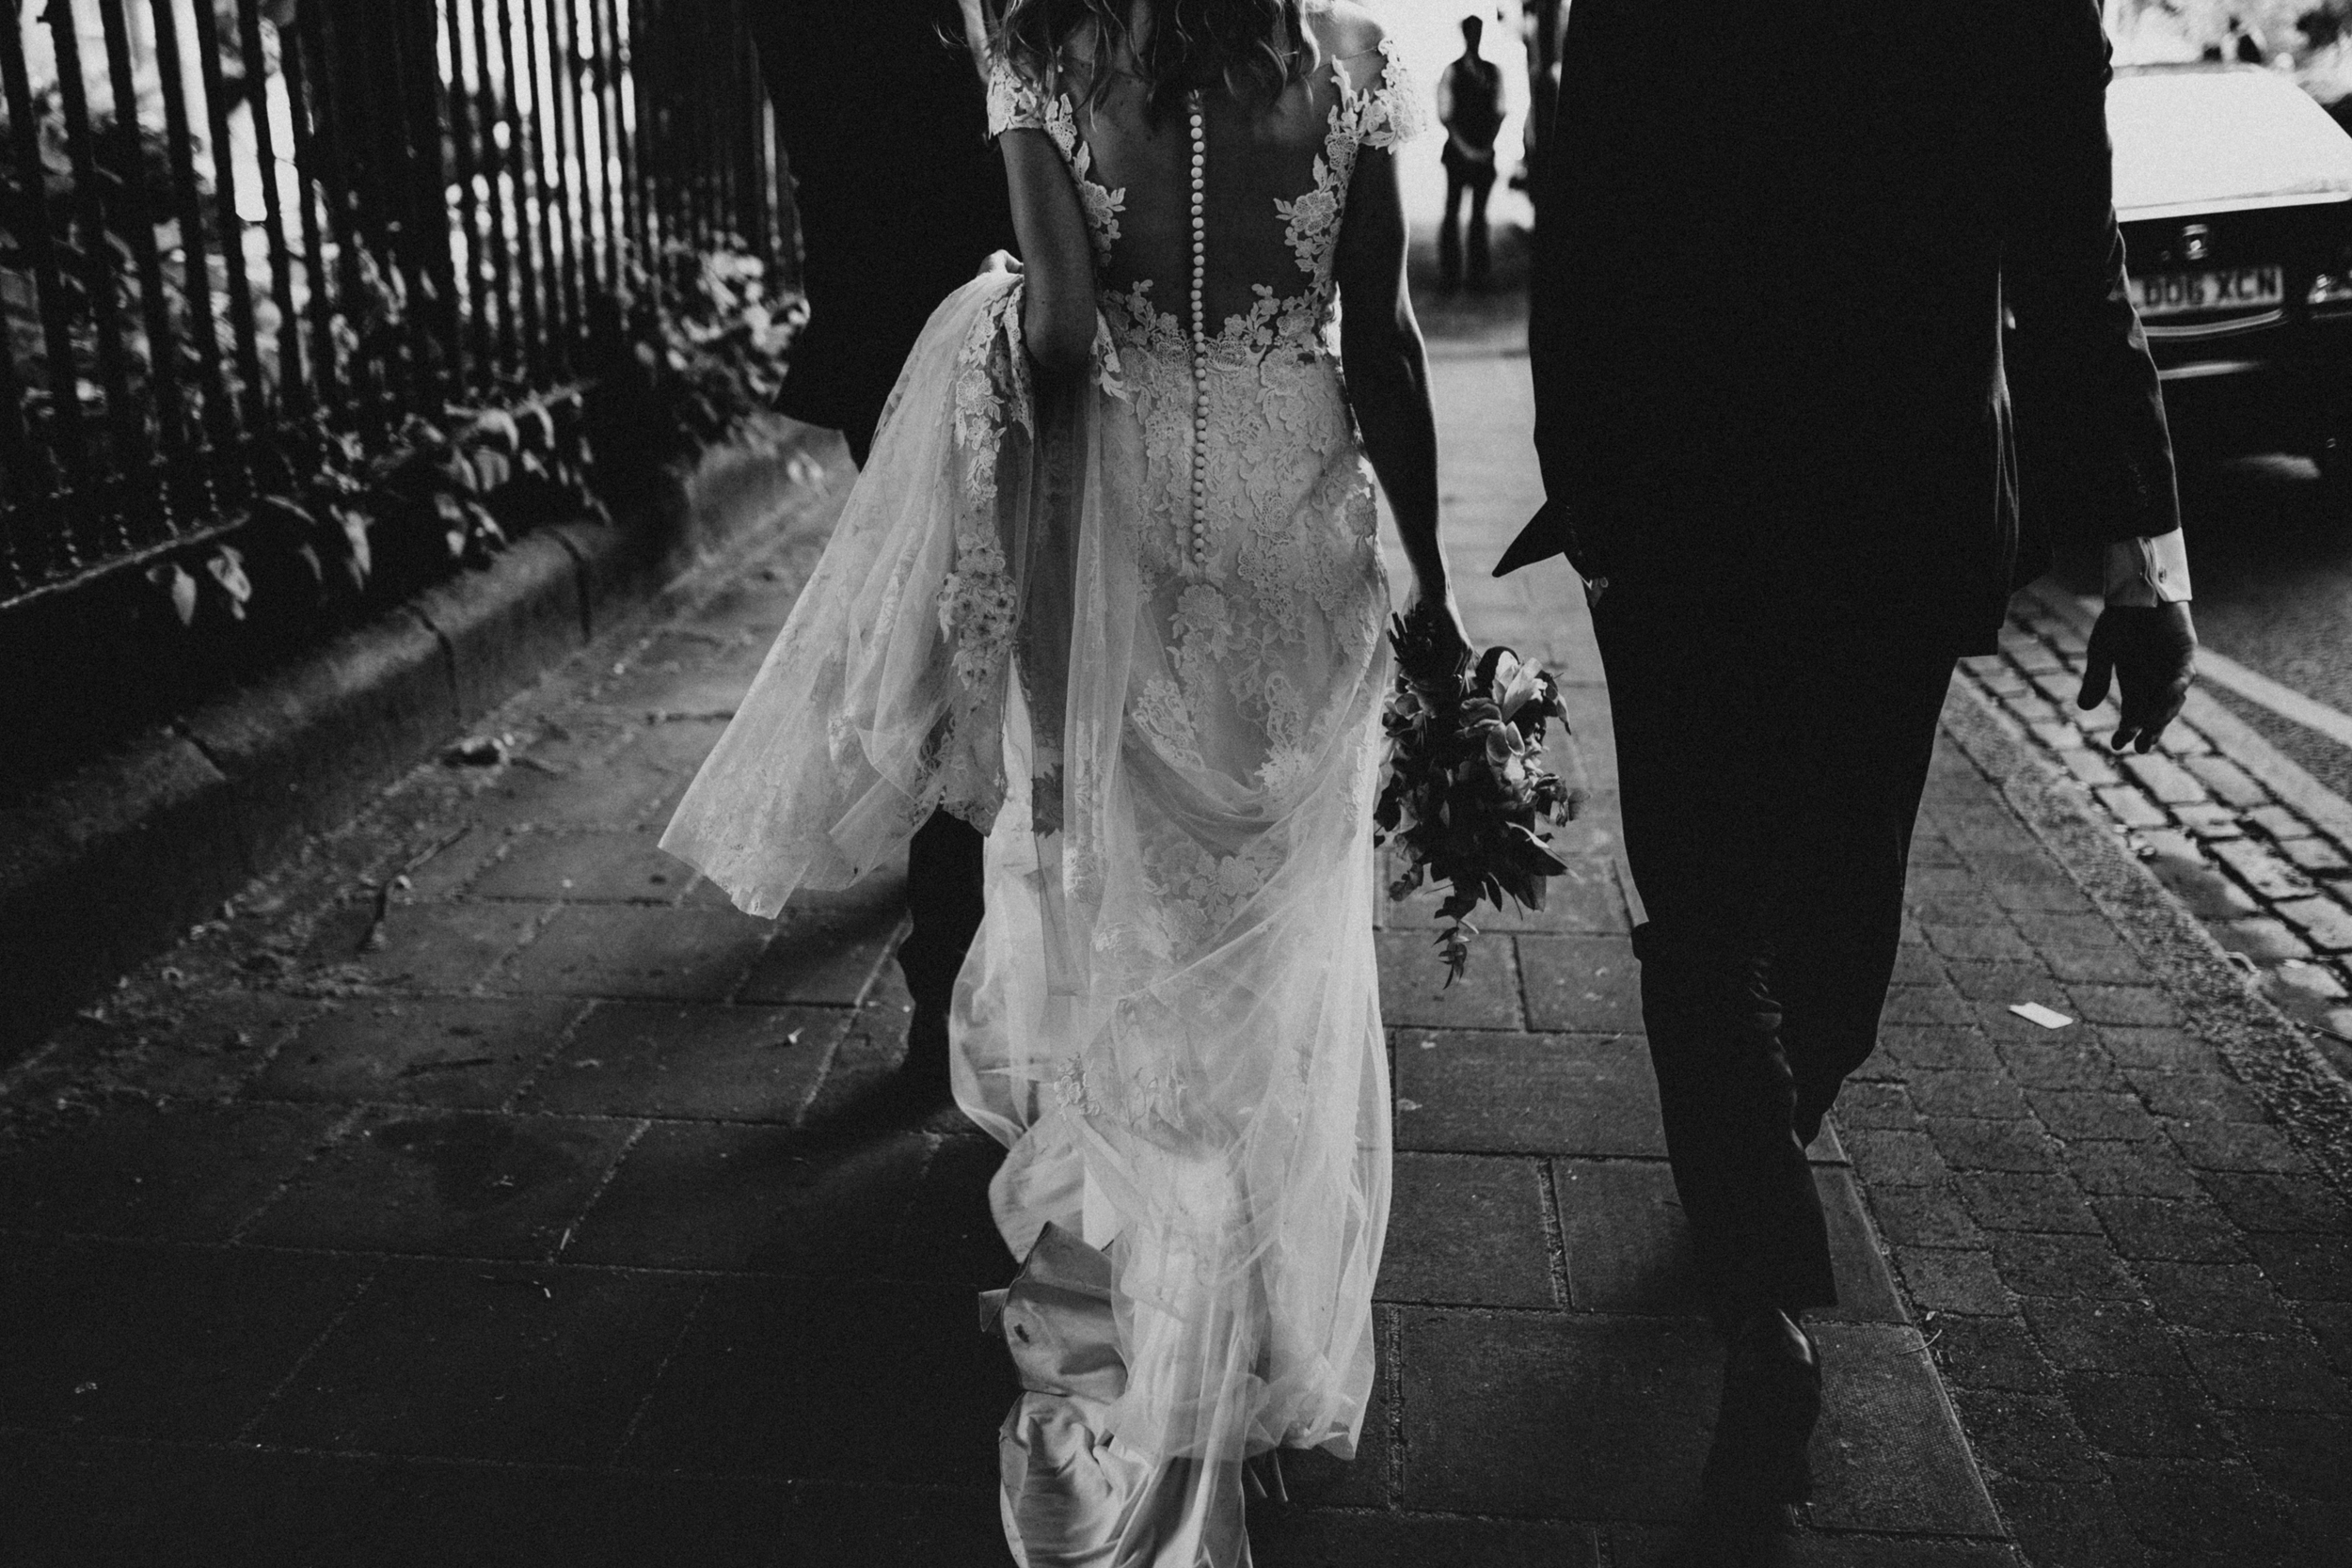 Laura-Benn-The-Asylum-London-The-Ace-Hotel-Wedding-Alternative-Darina-Stoda-Photography-461.jpg